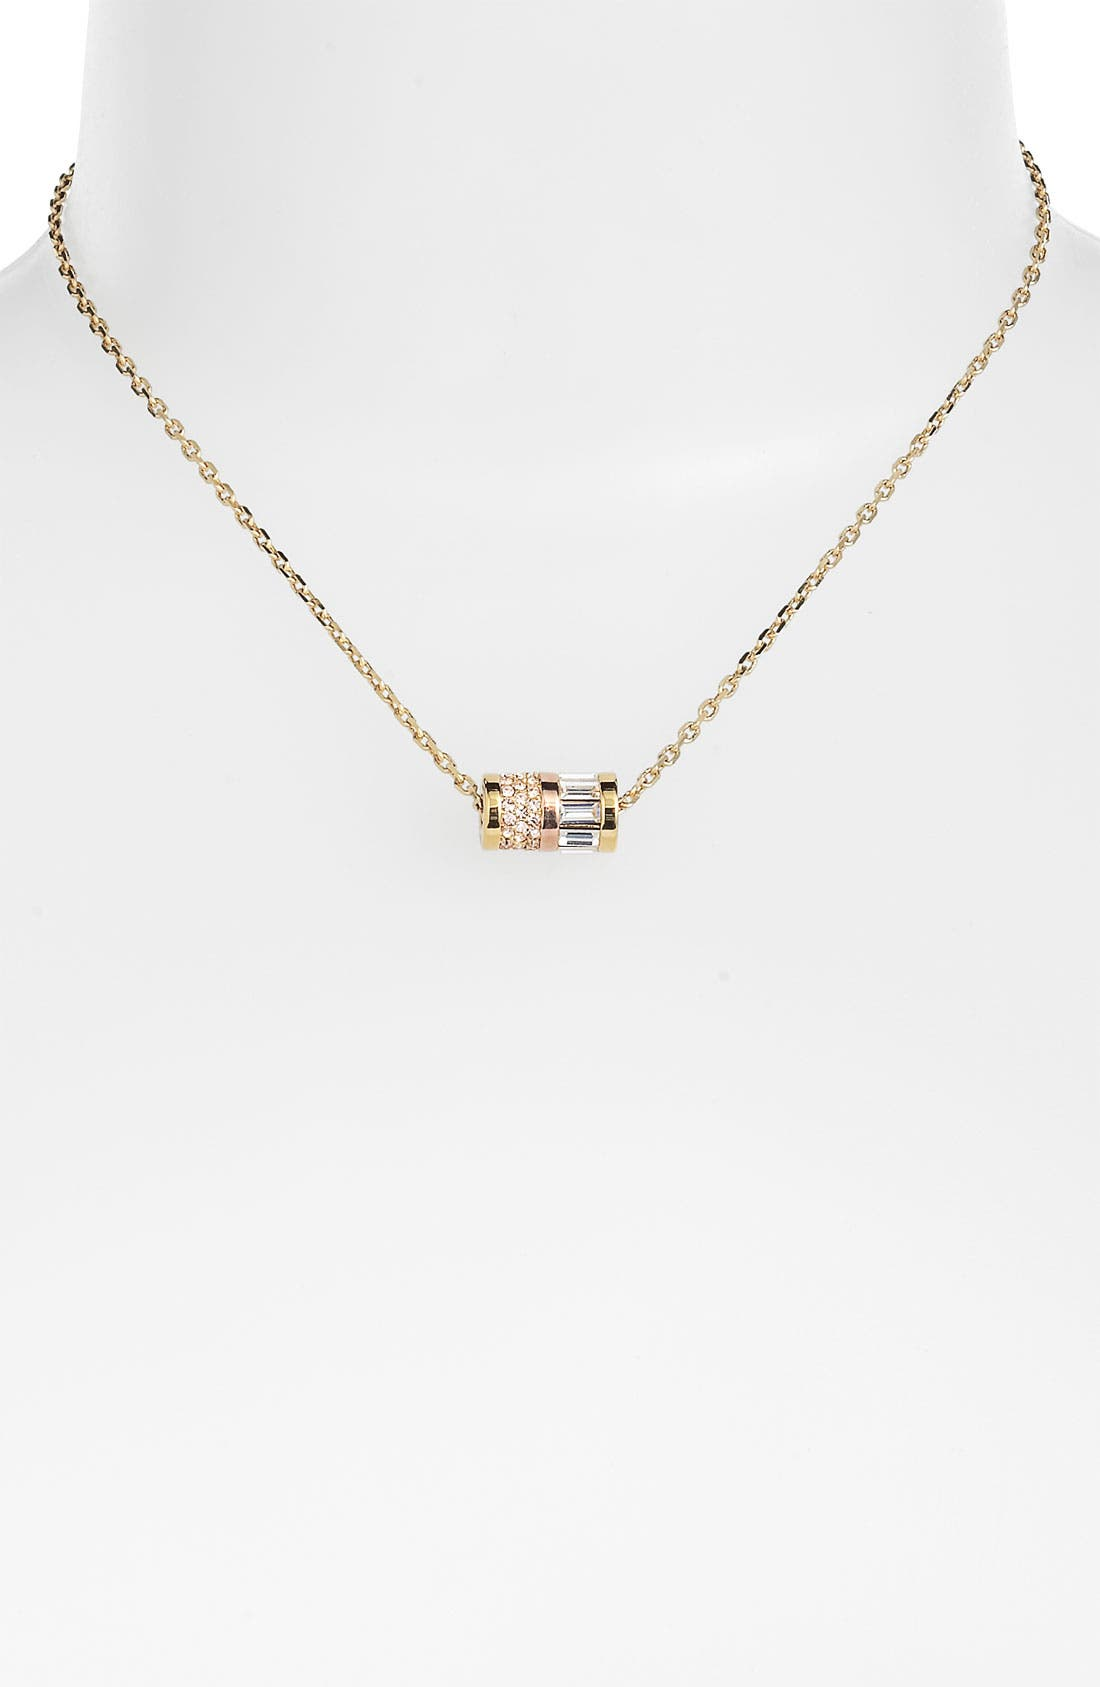 Alternate Image 1 Selected - Michael Kors 'Brilliance' Pendant Necklace